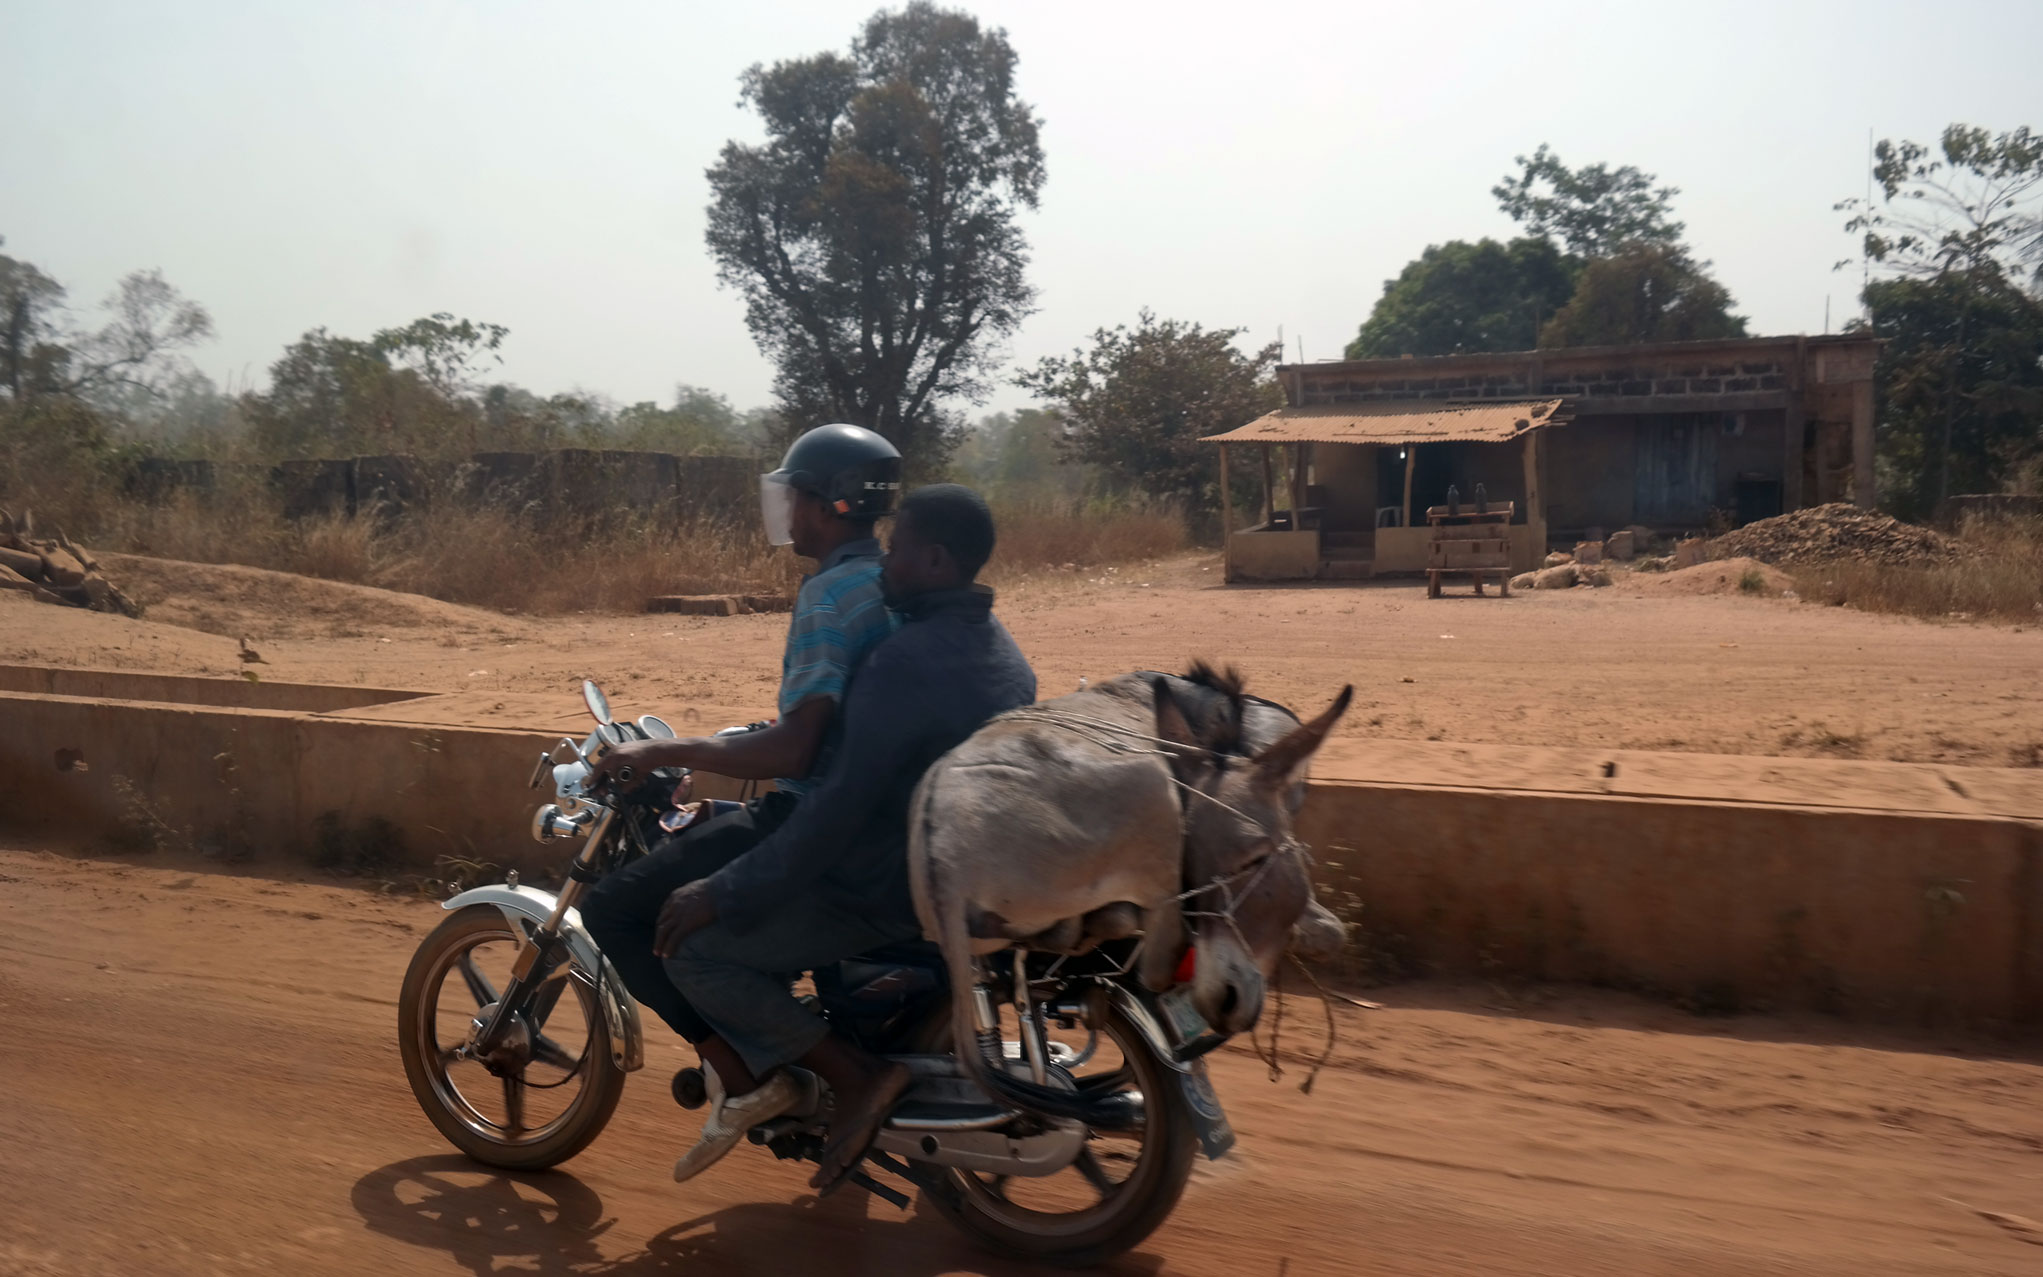 Donkey on motorbike